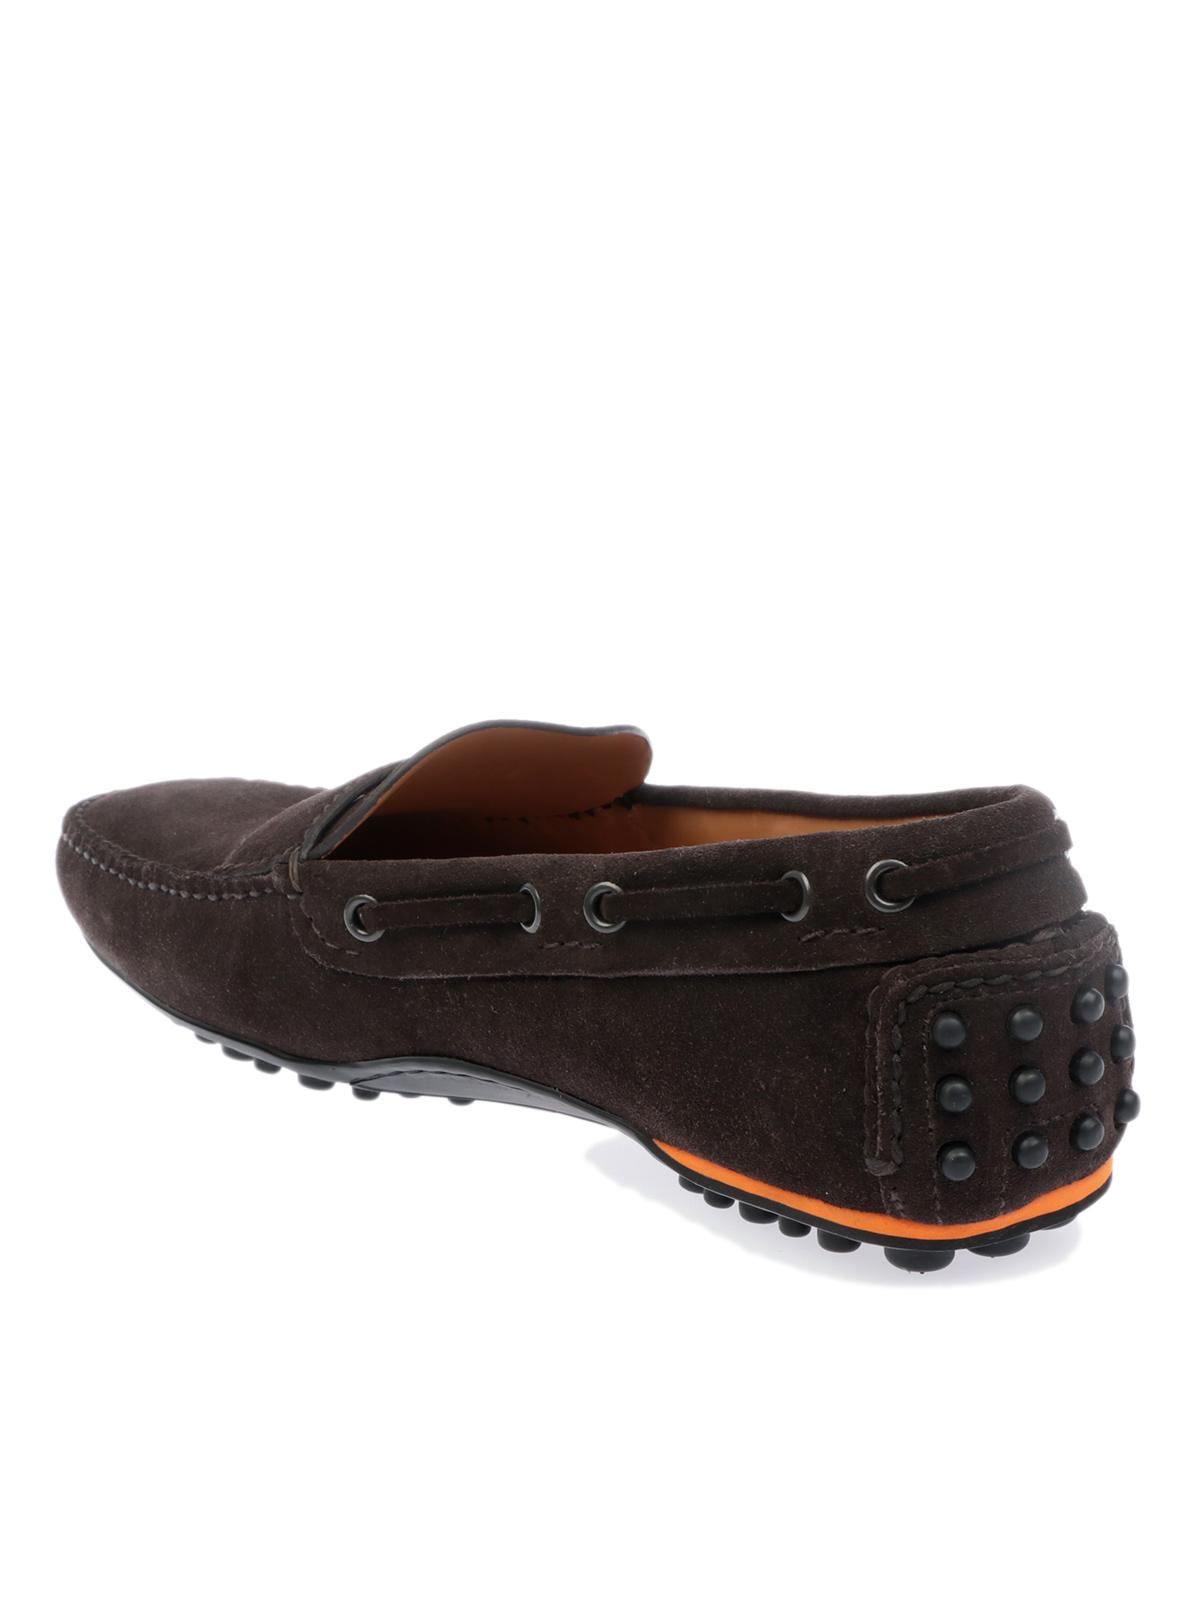 Picture of CAR Shoe | Men's Calf Suede Driving Shoe